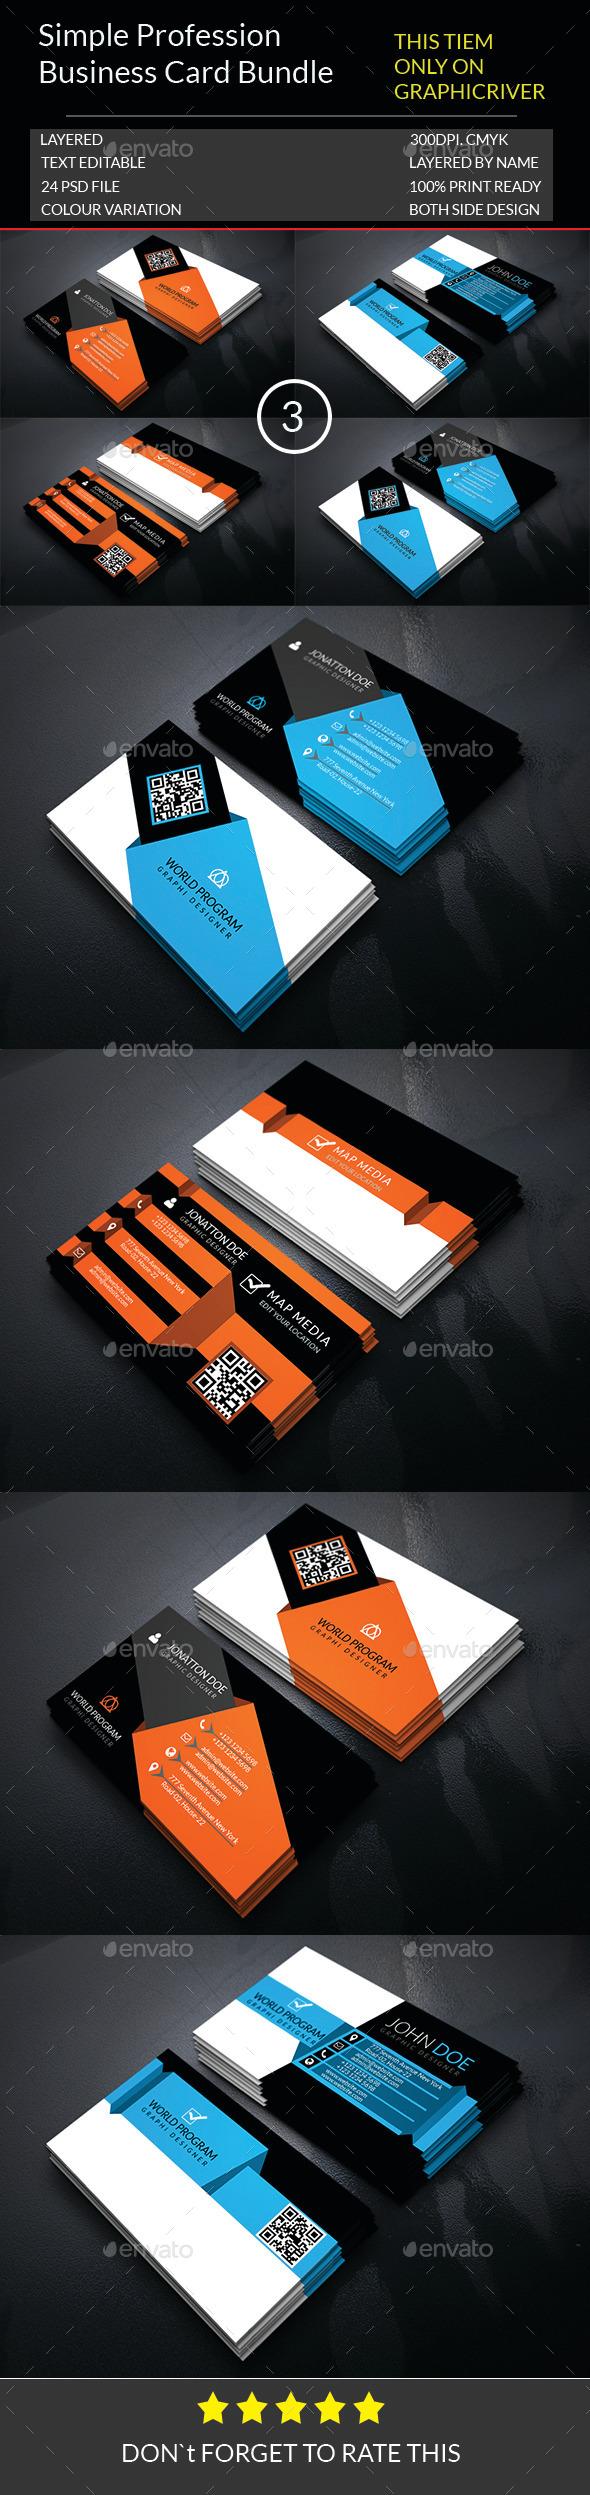 Simple Profession Business card Bundle.003 - Business Cards Print Templates